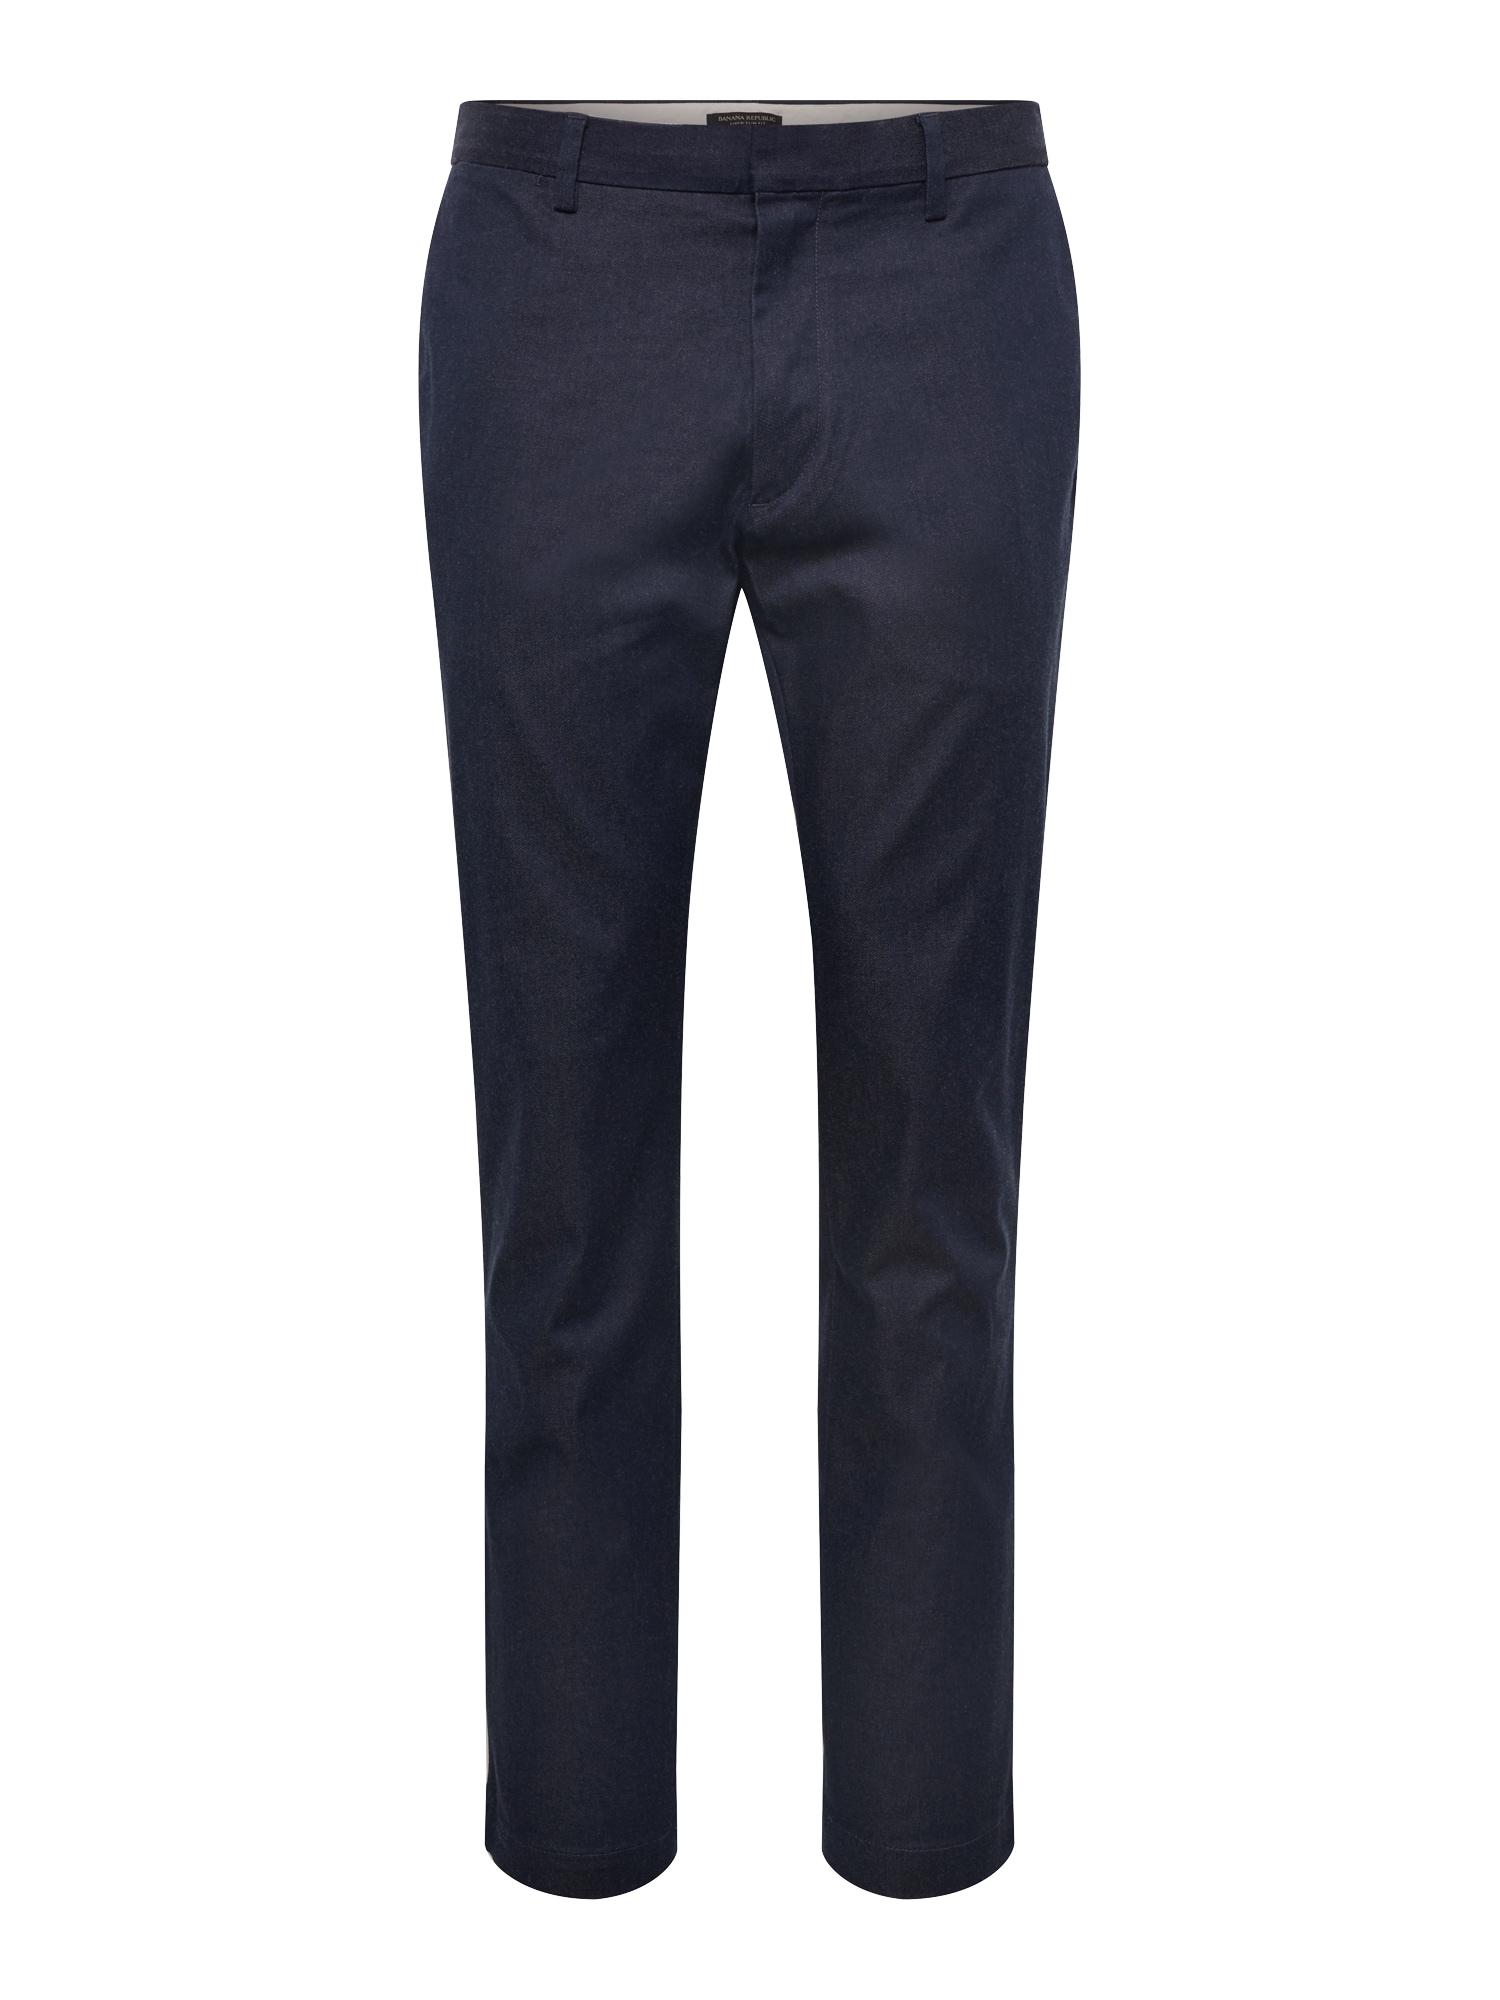 Chino kalhoty AIDEN HEATHERED RMC námořnická modř Banana Republic